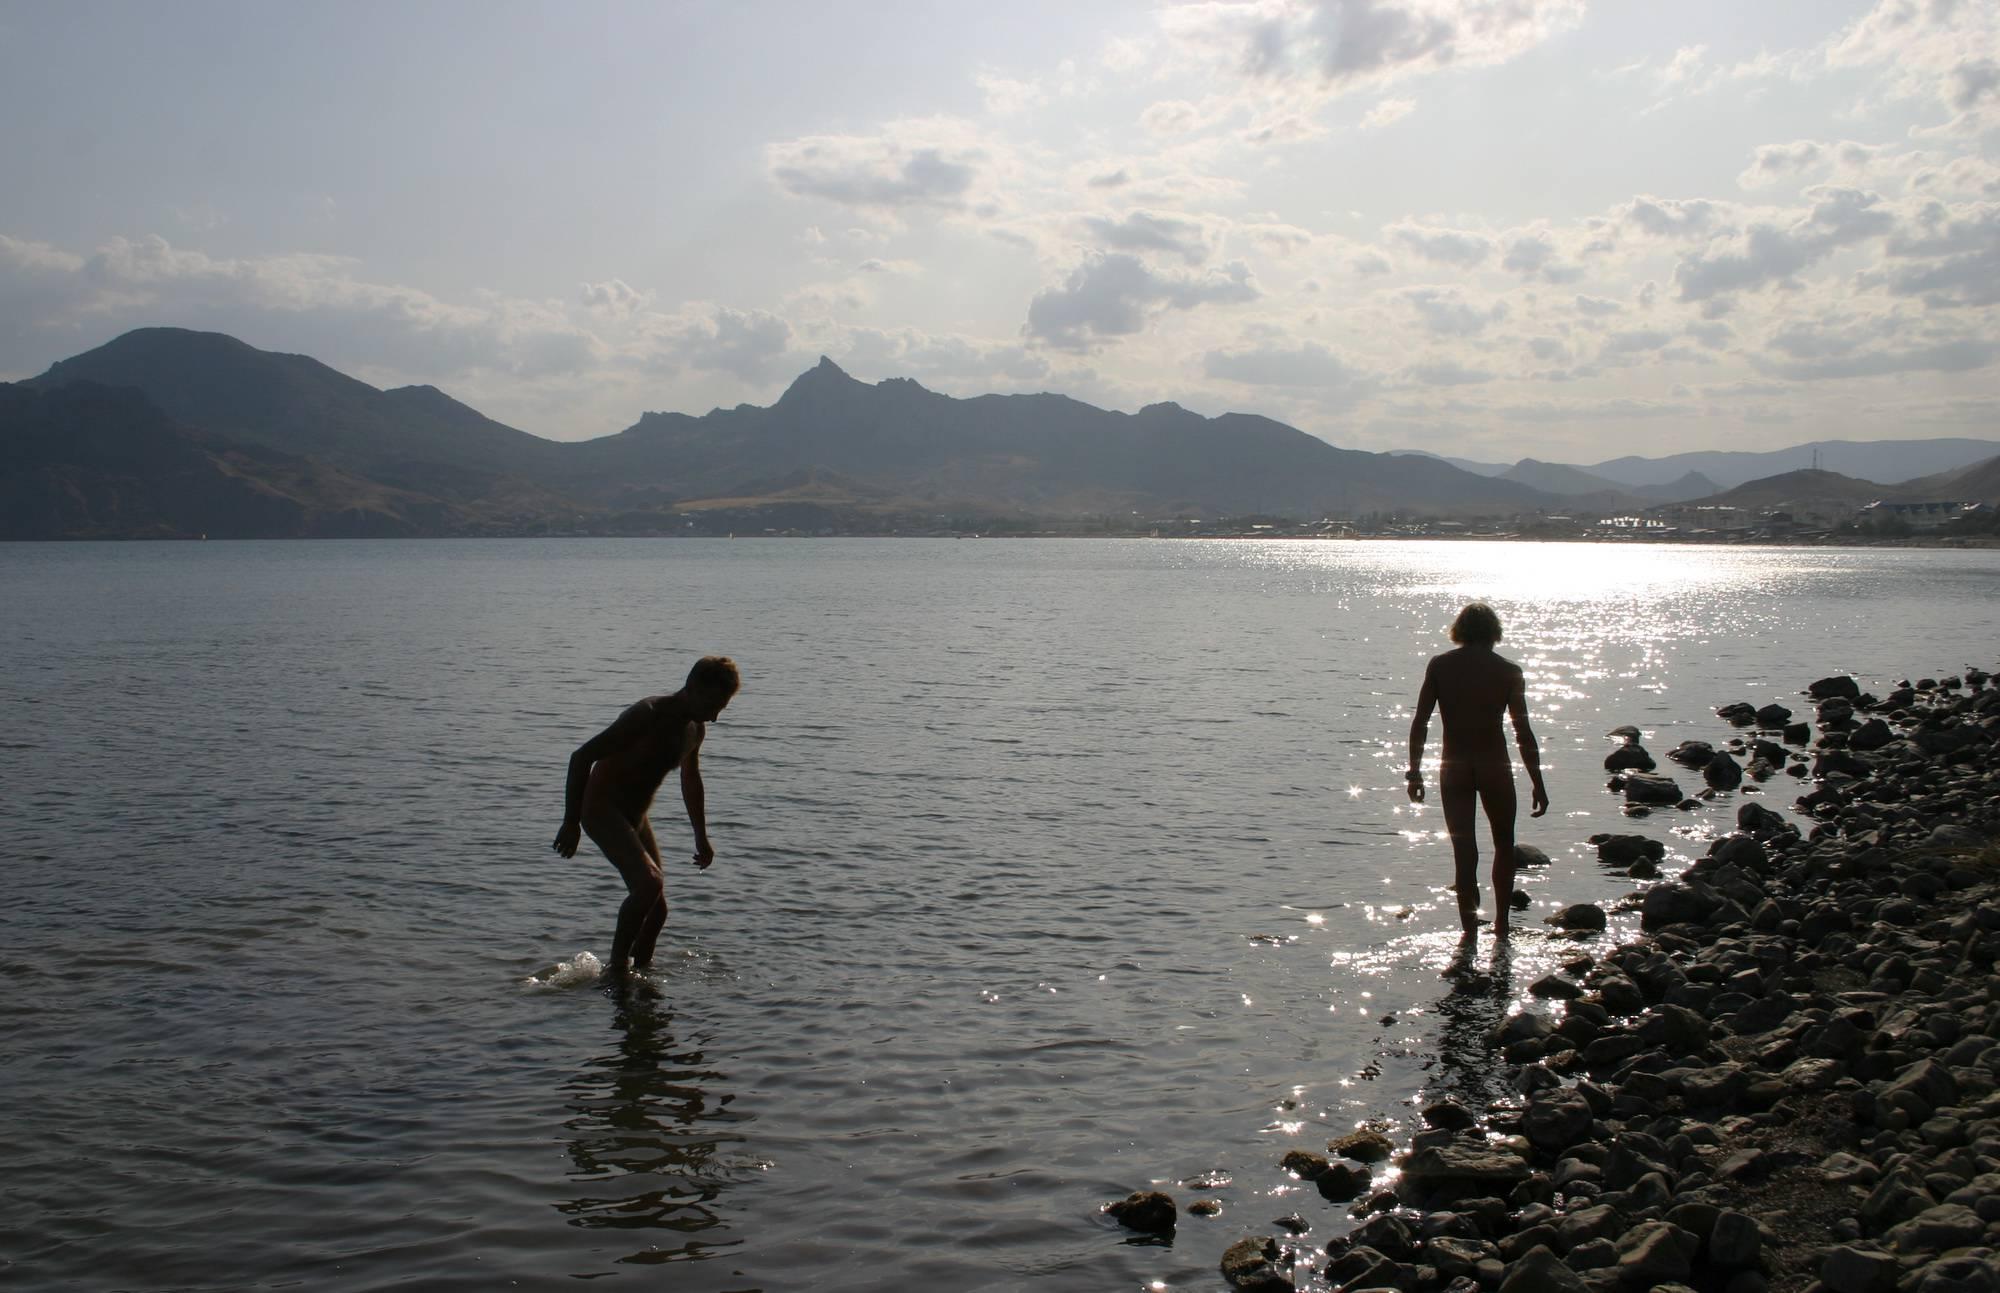 Nudist Photos Finding Seas Little Crabs - 2